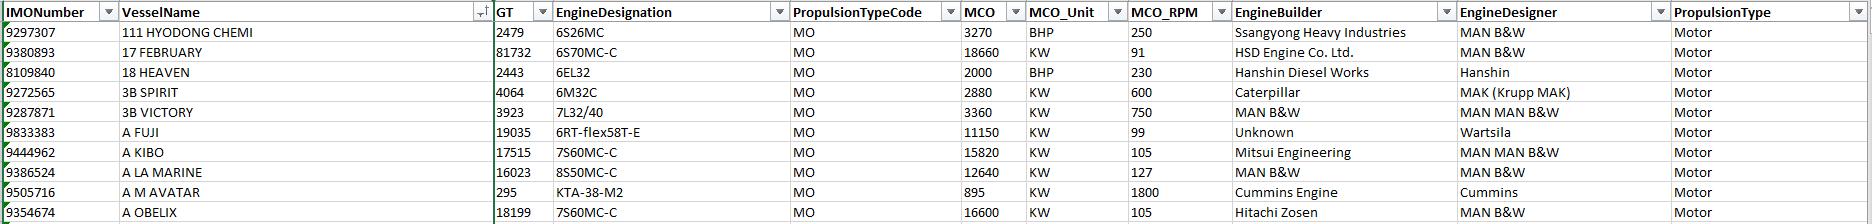 Download csv Vessel Engine Type database